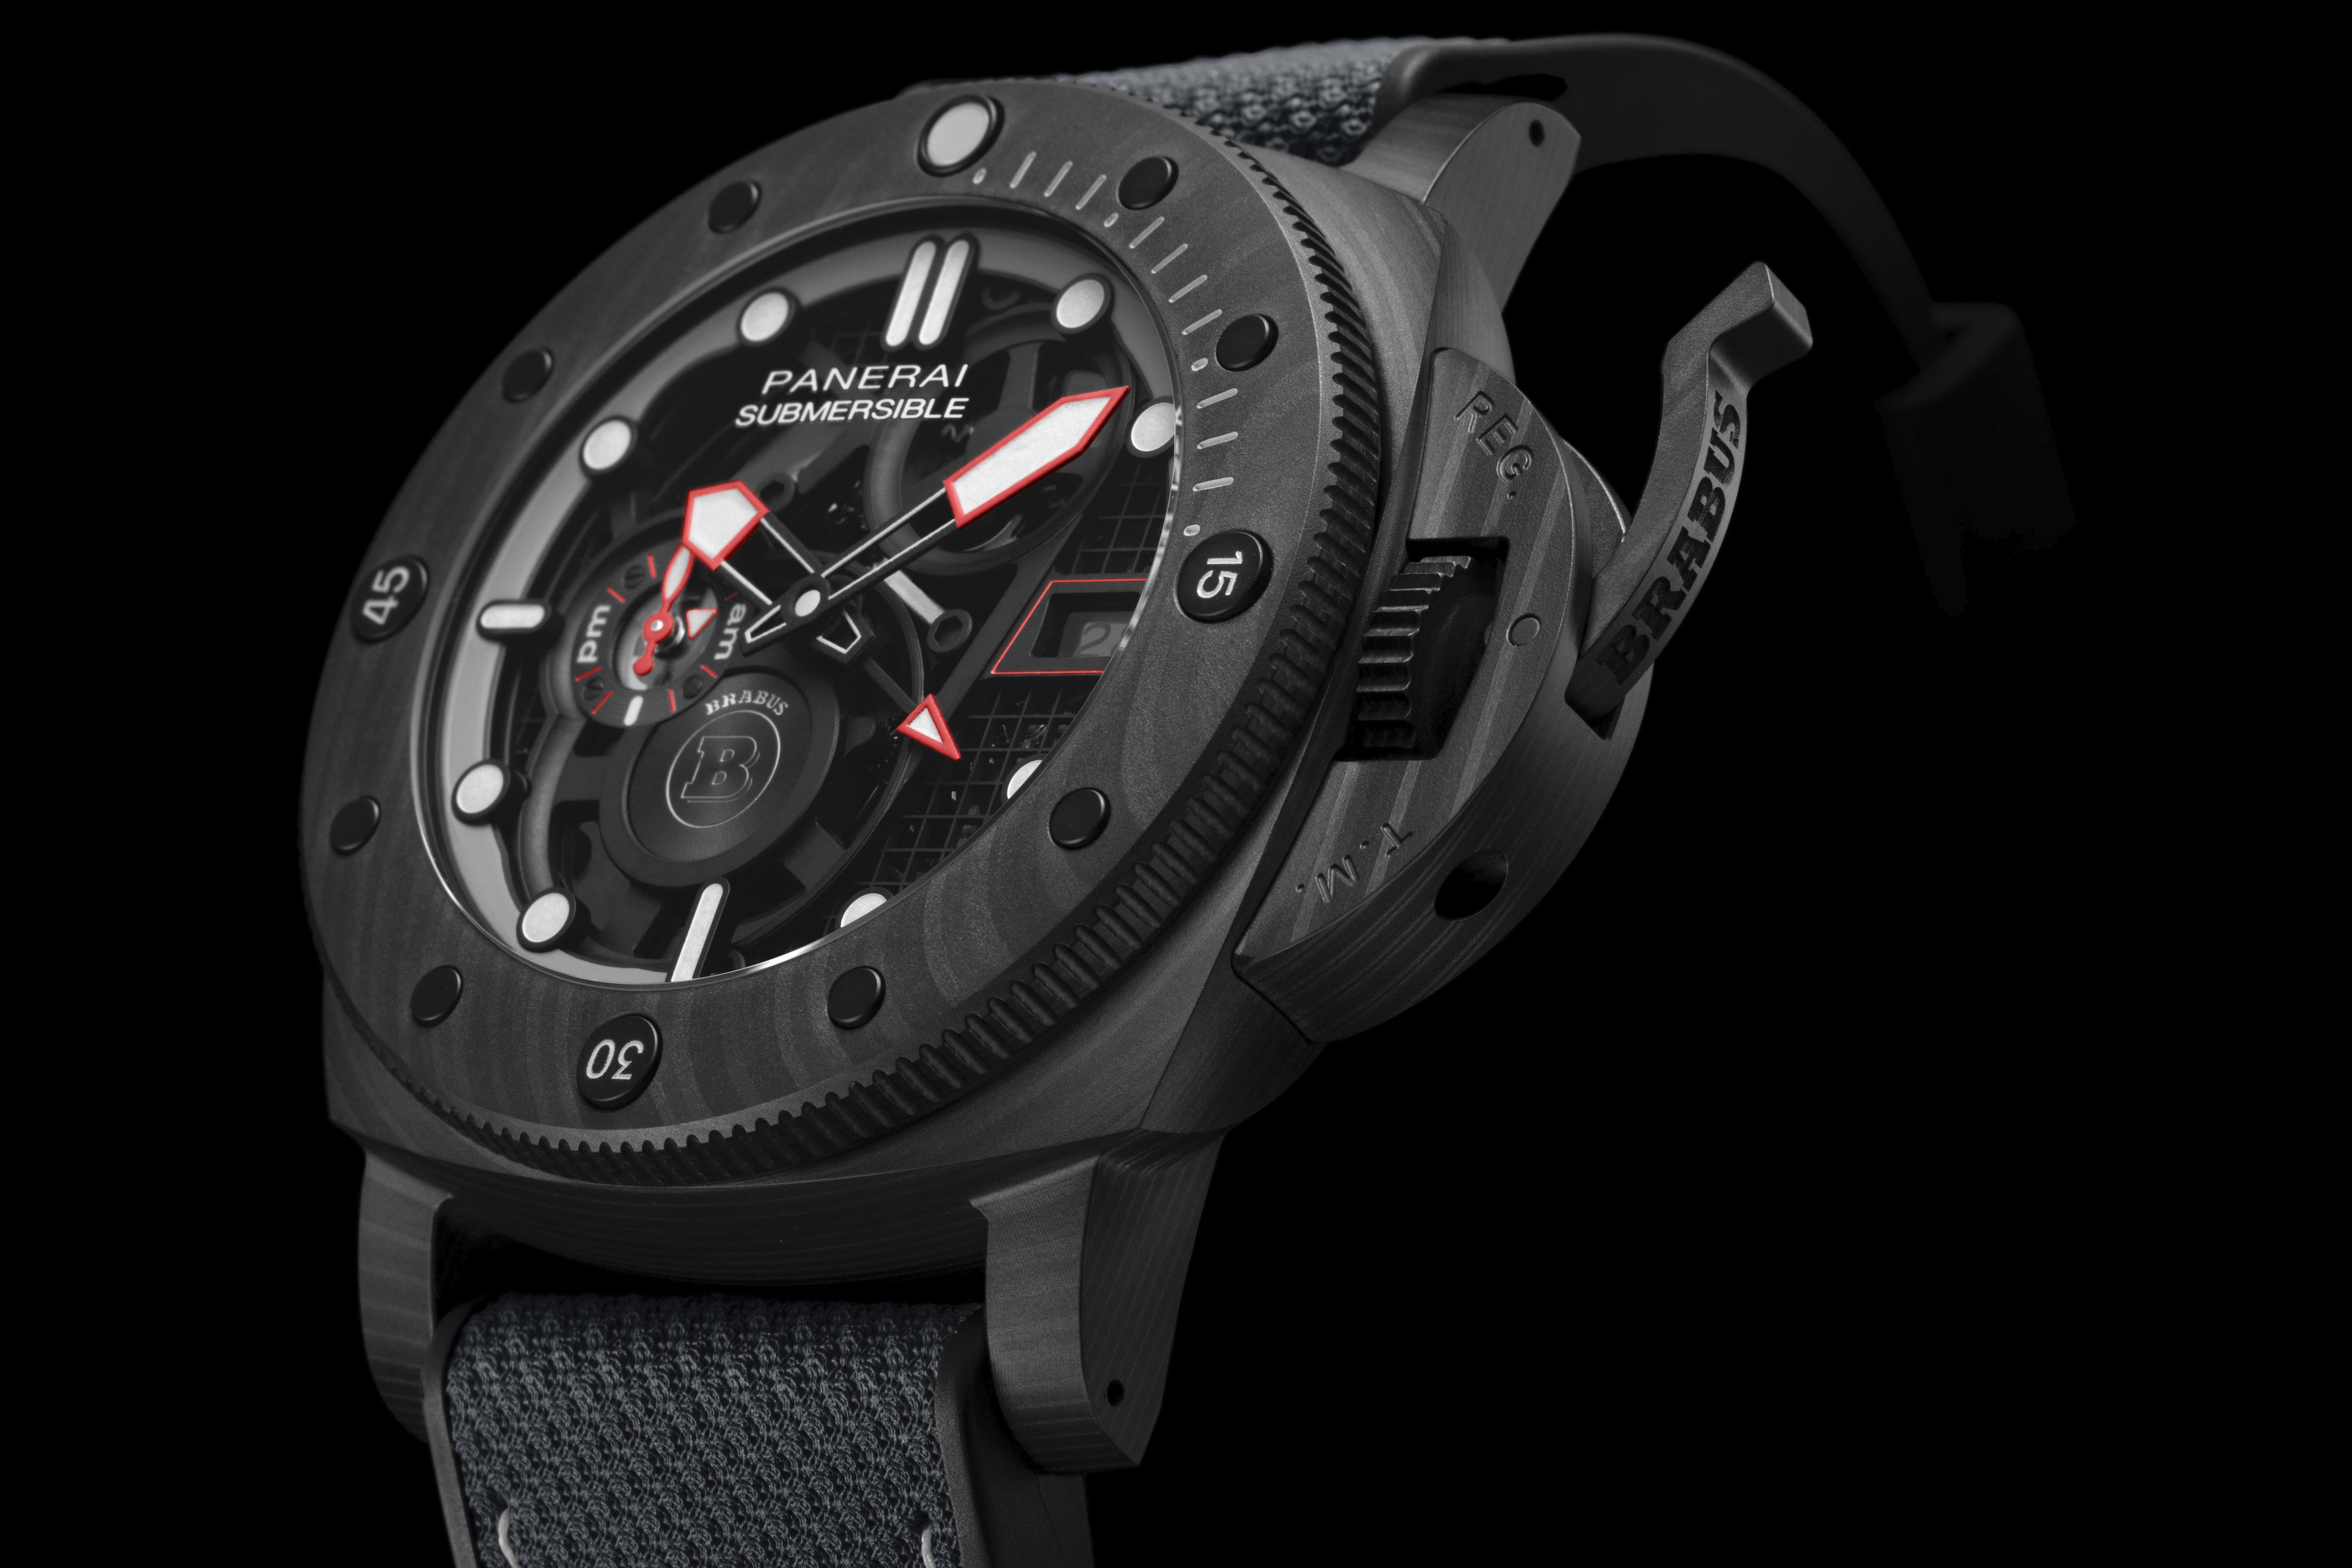 Panerai-Submersible-S-BRABUS-Black-Ops-Edition